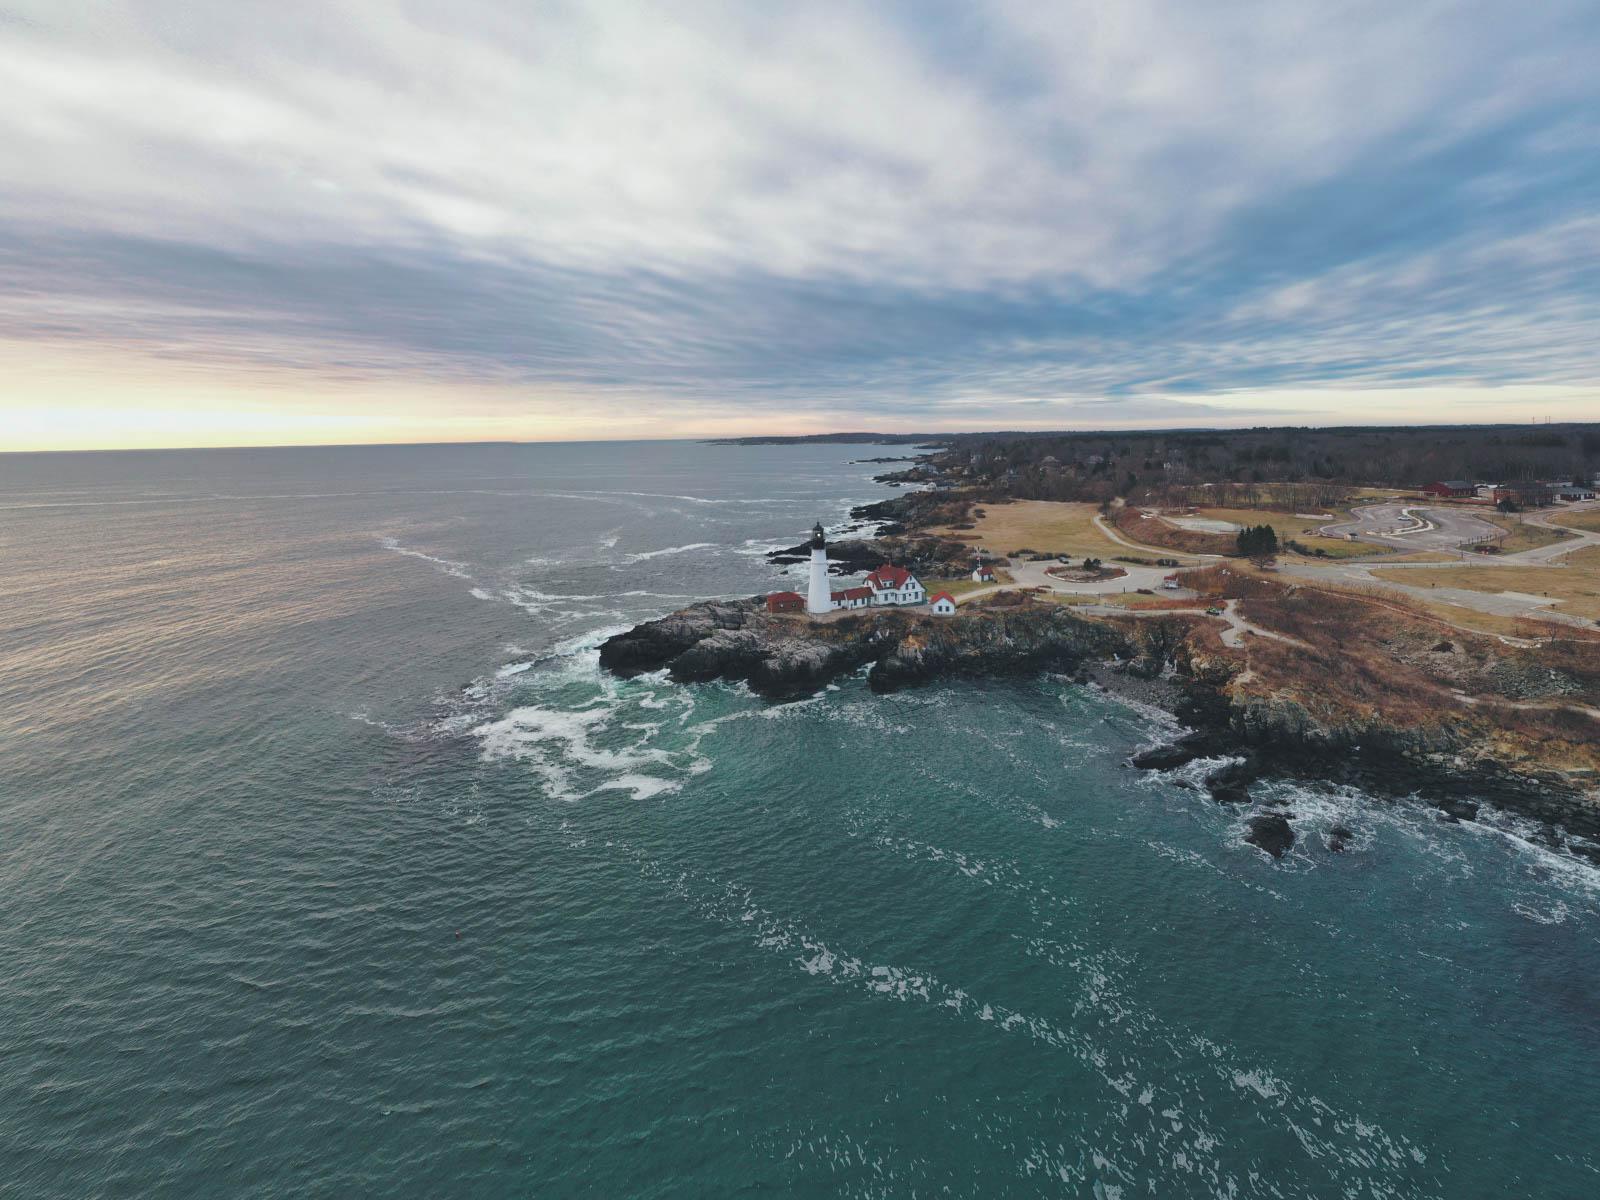 Aerial View of Maine Coastline